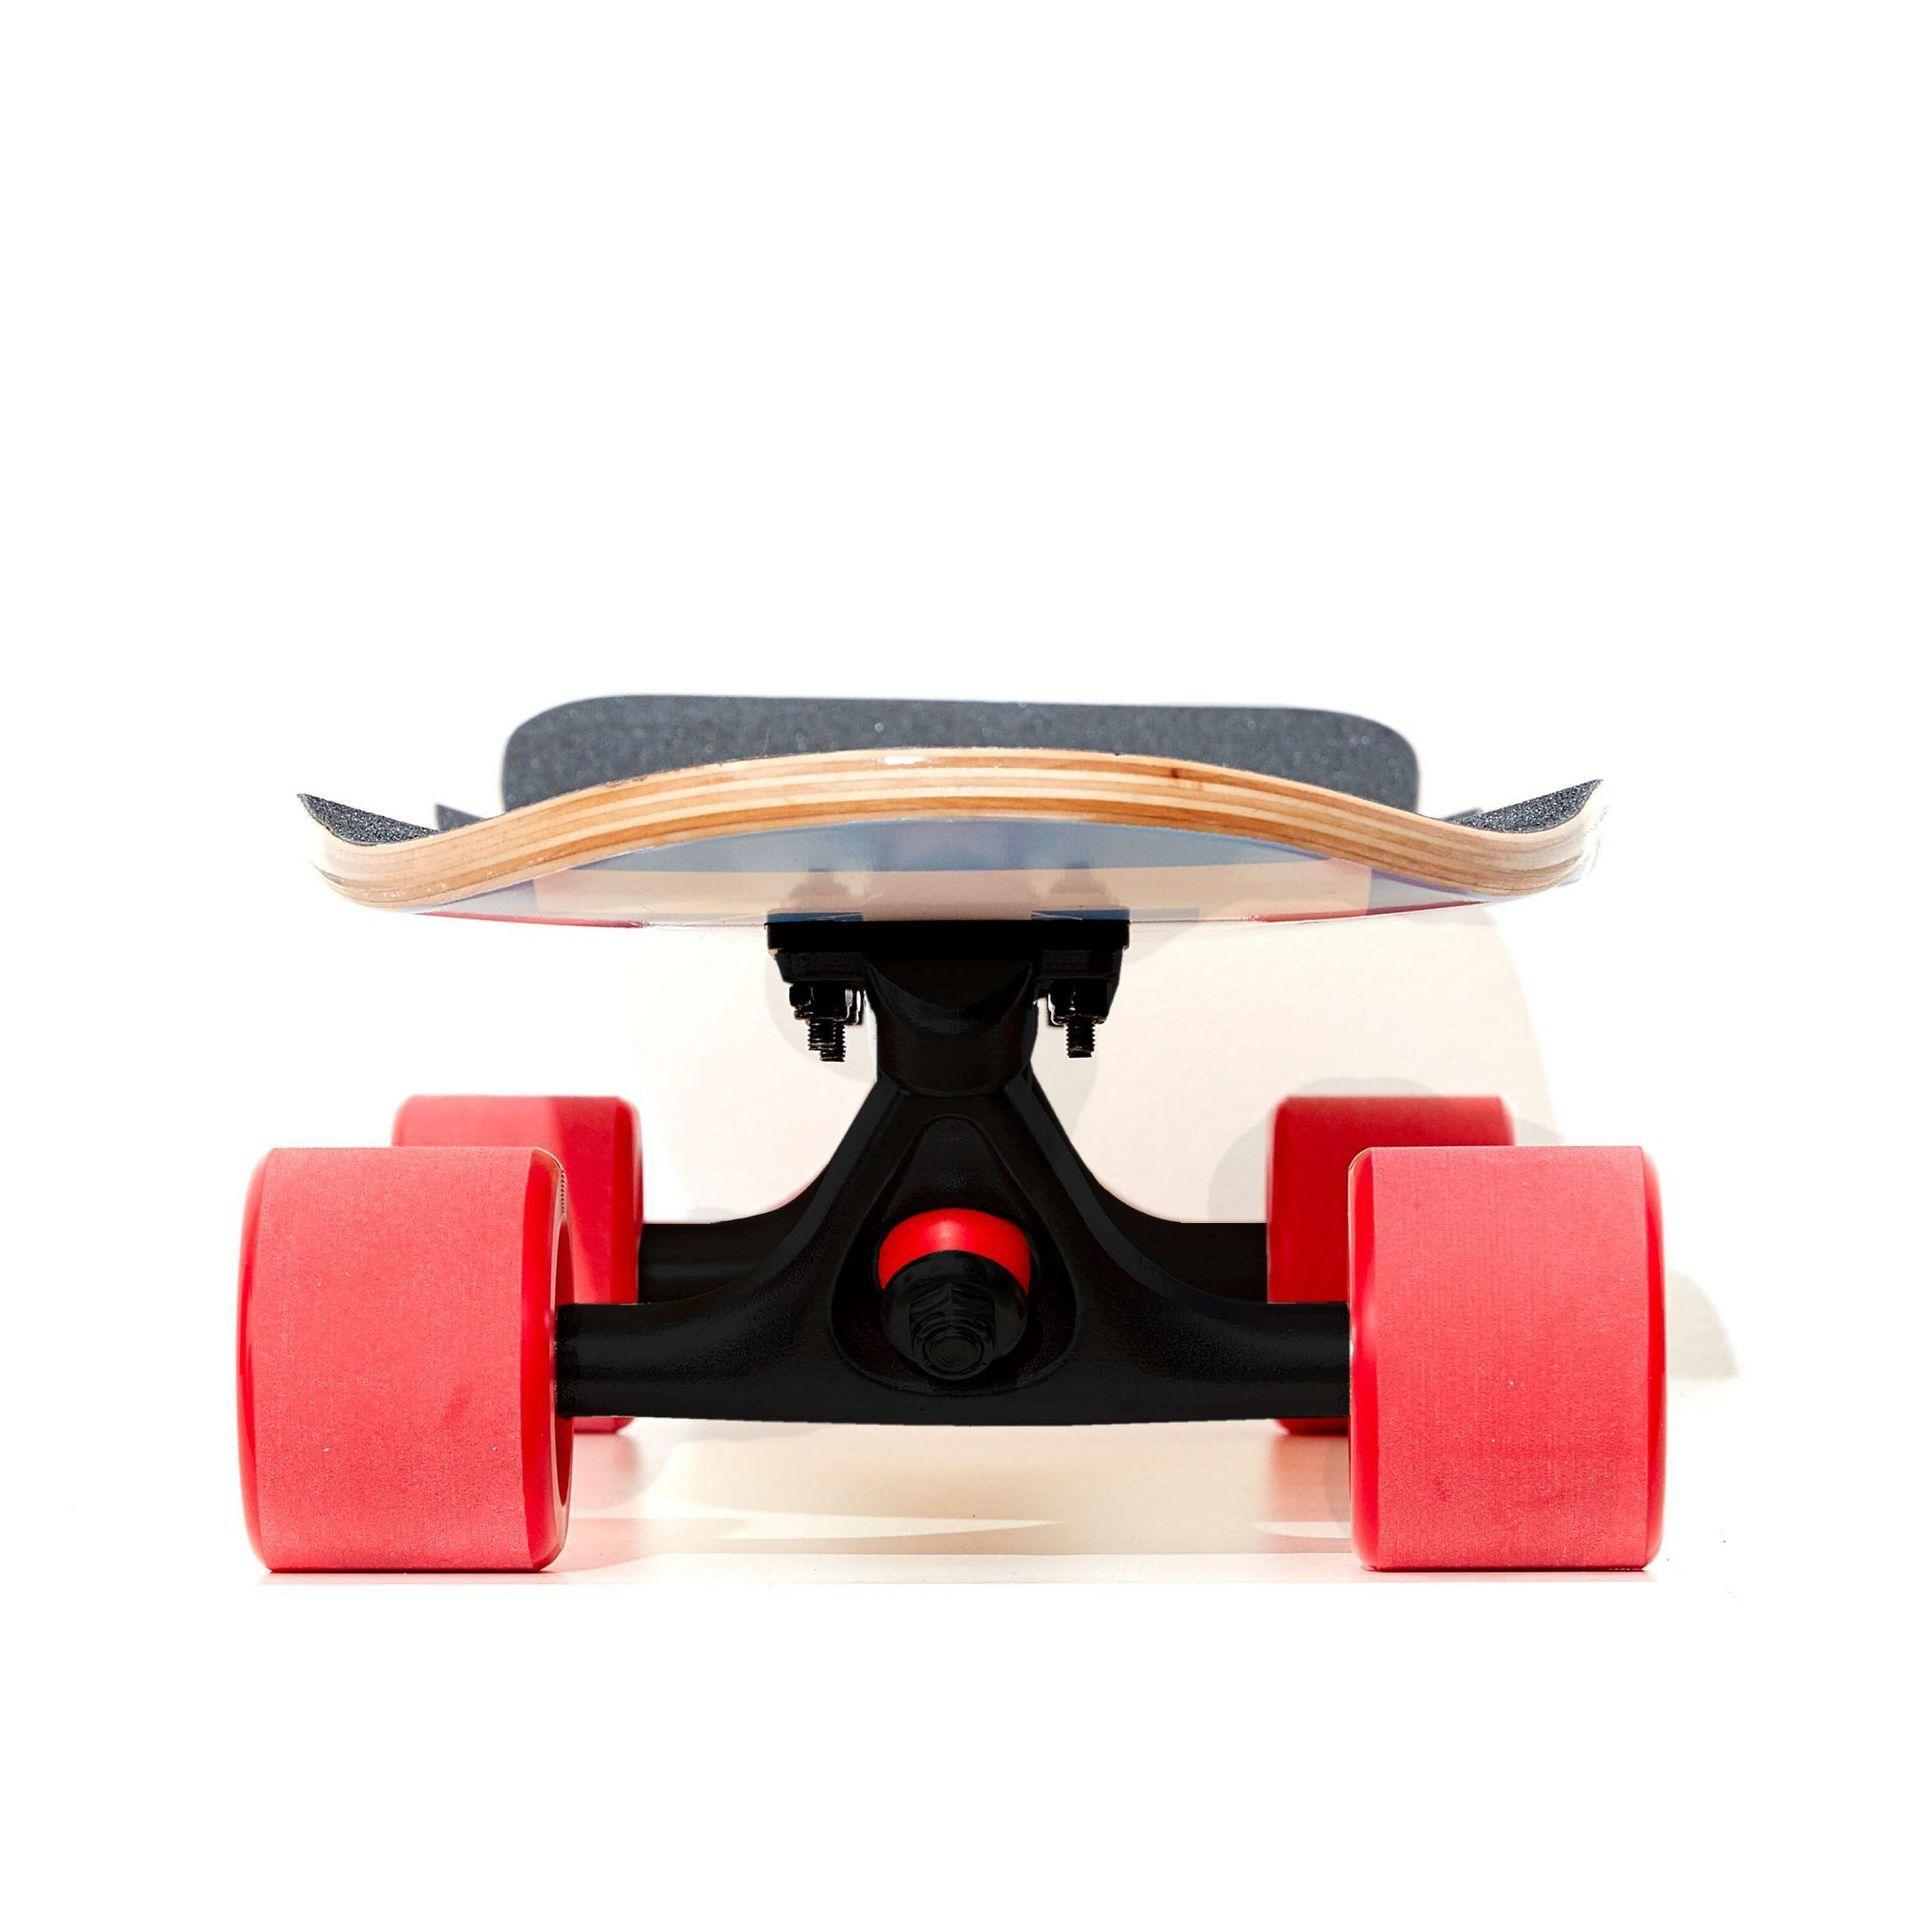 LONGBOARD FISH SKATEBOARDS CRUISER 32 FLOUNDER|BLACK|RED 2